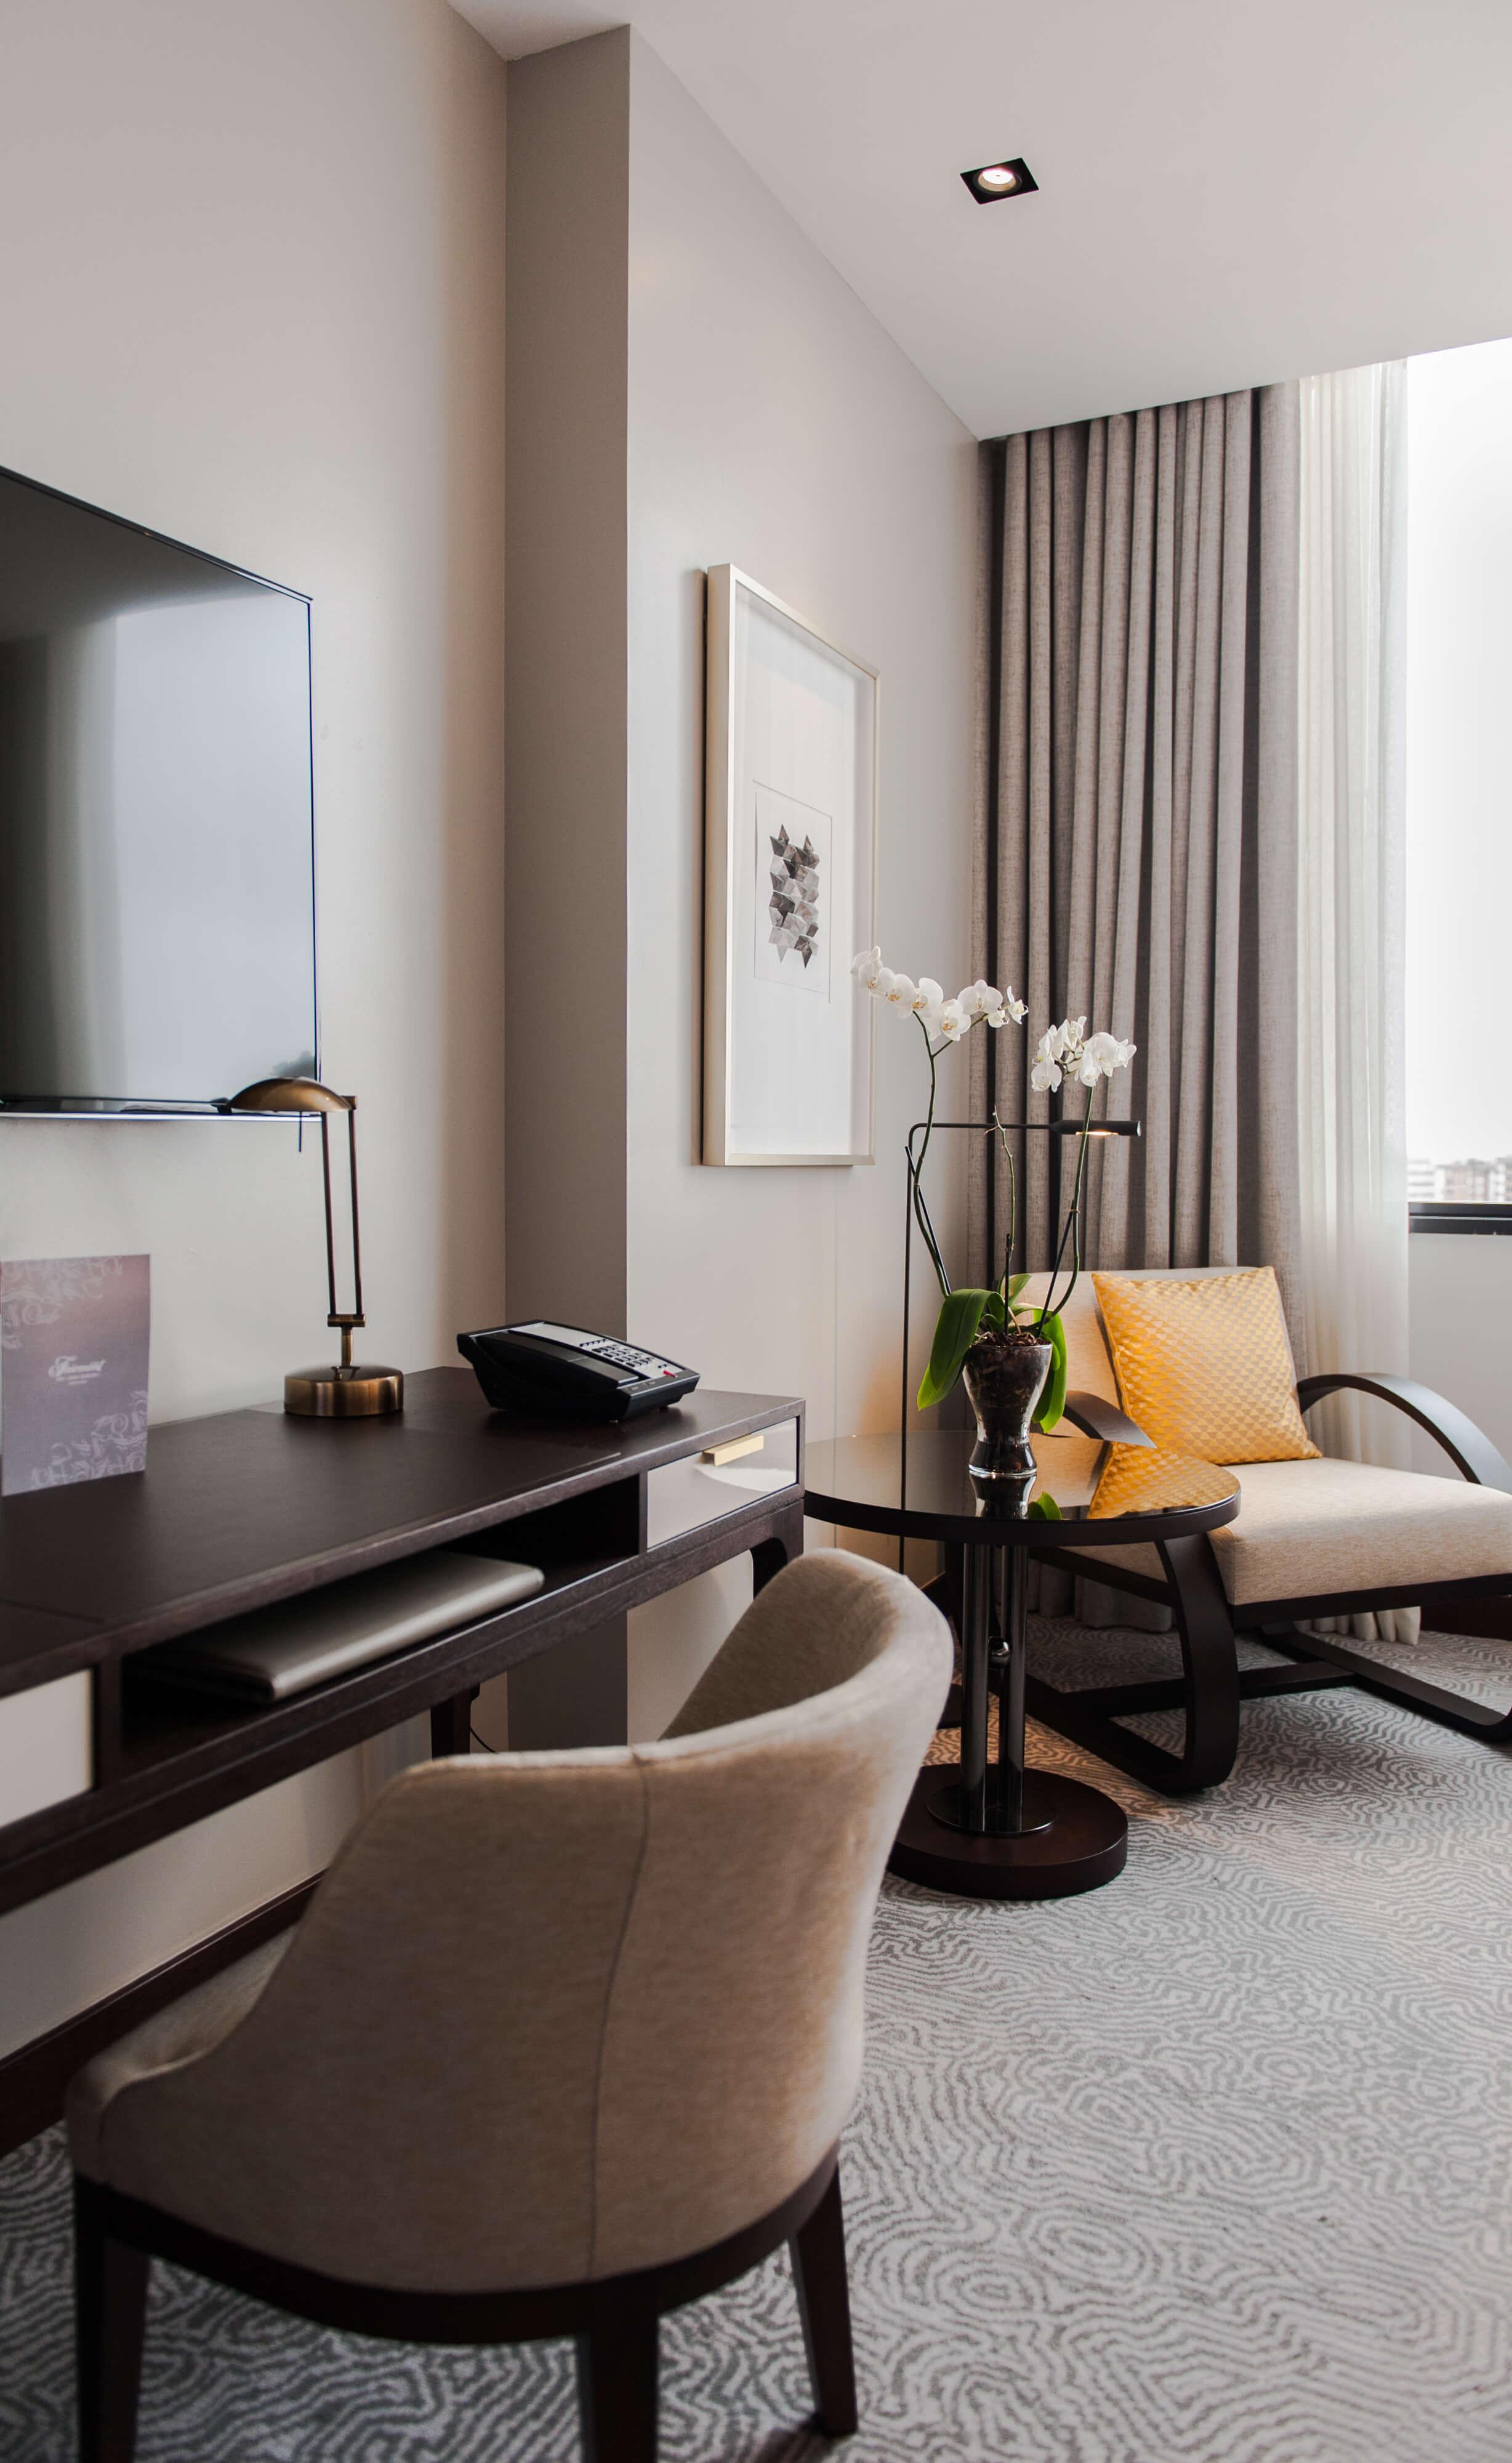 Hotel-Fairmont-habitacion1.jpg